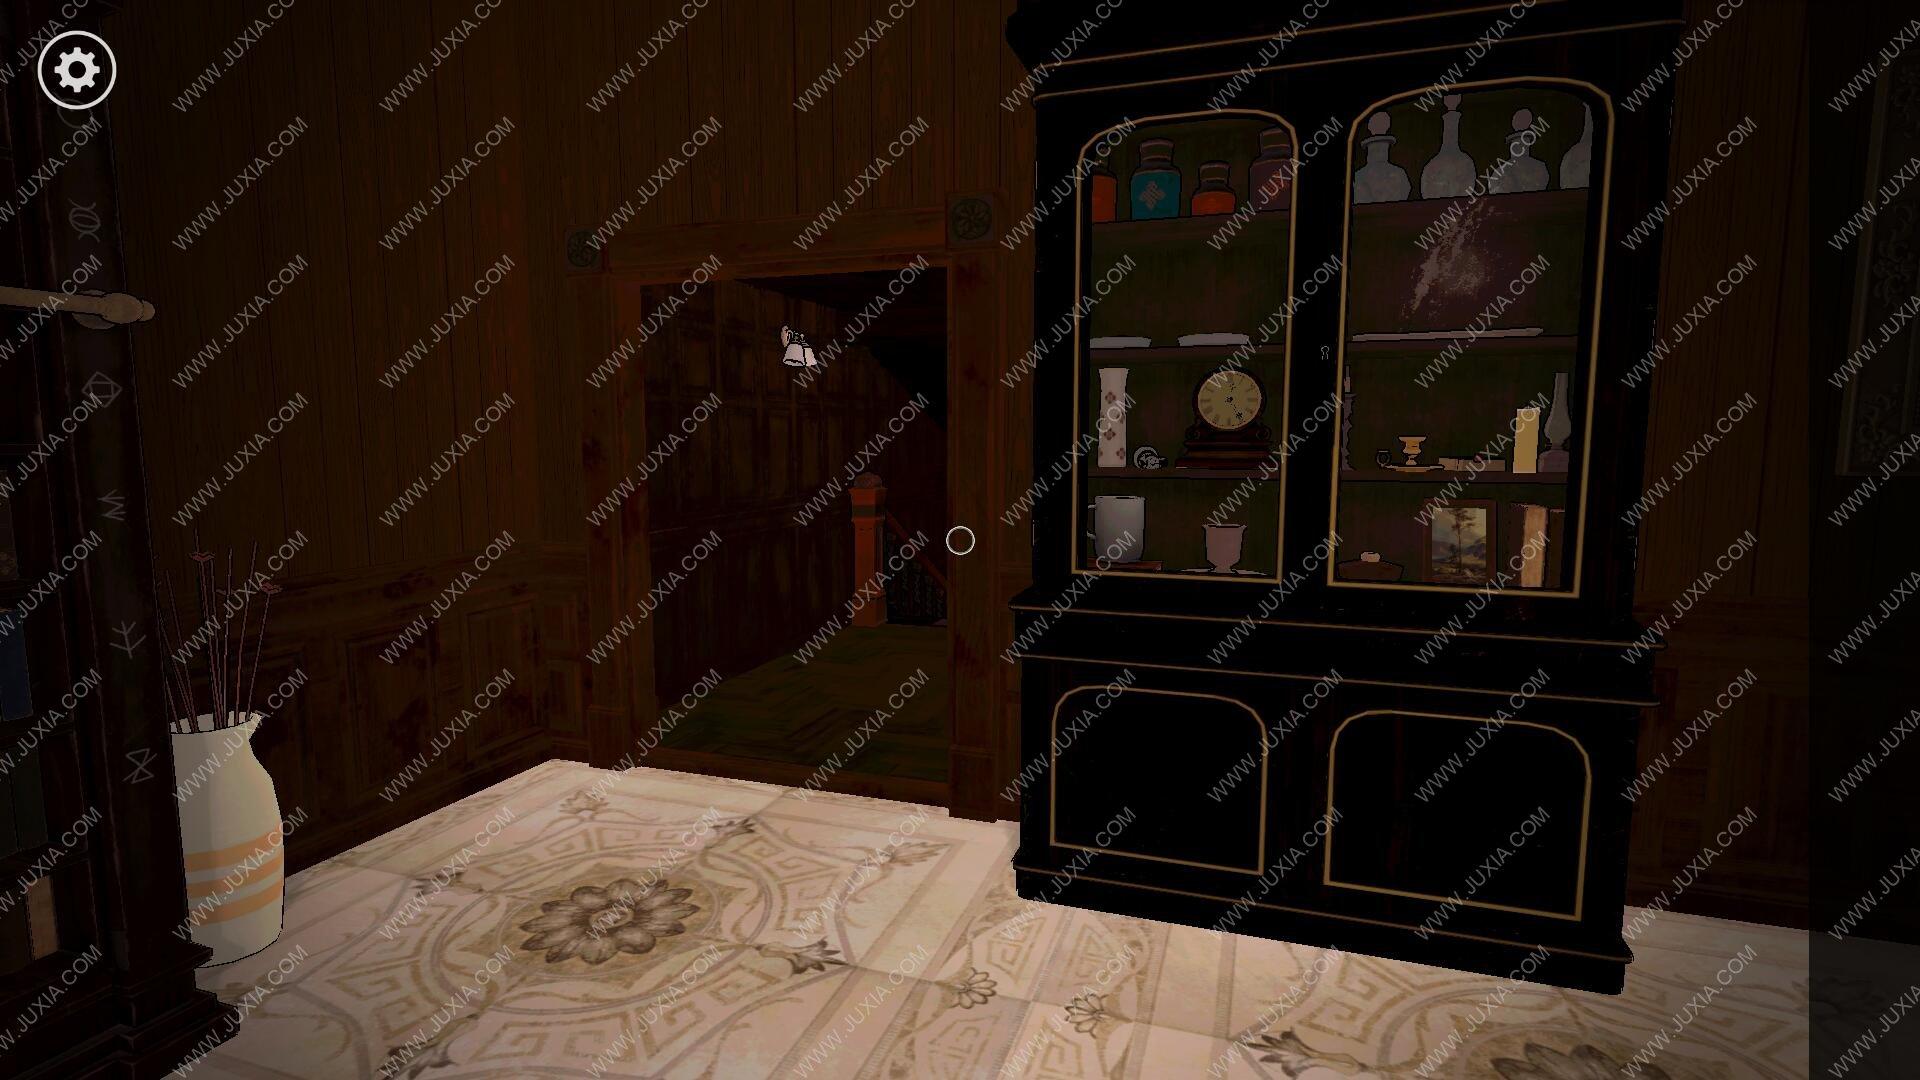 AIDATheBeginningoftheStory攻略房间1 钥匙怎么获得